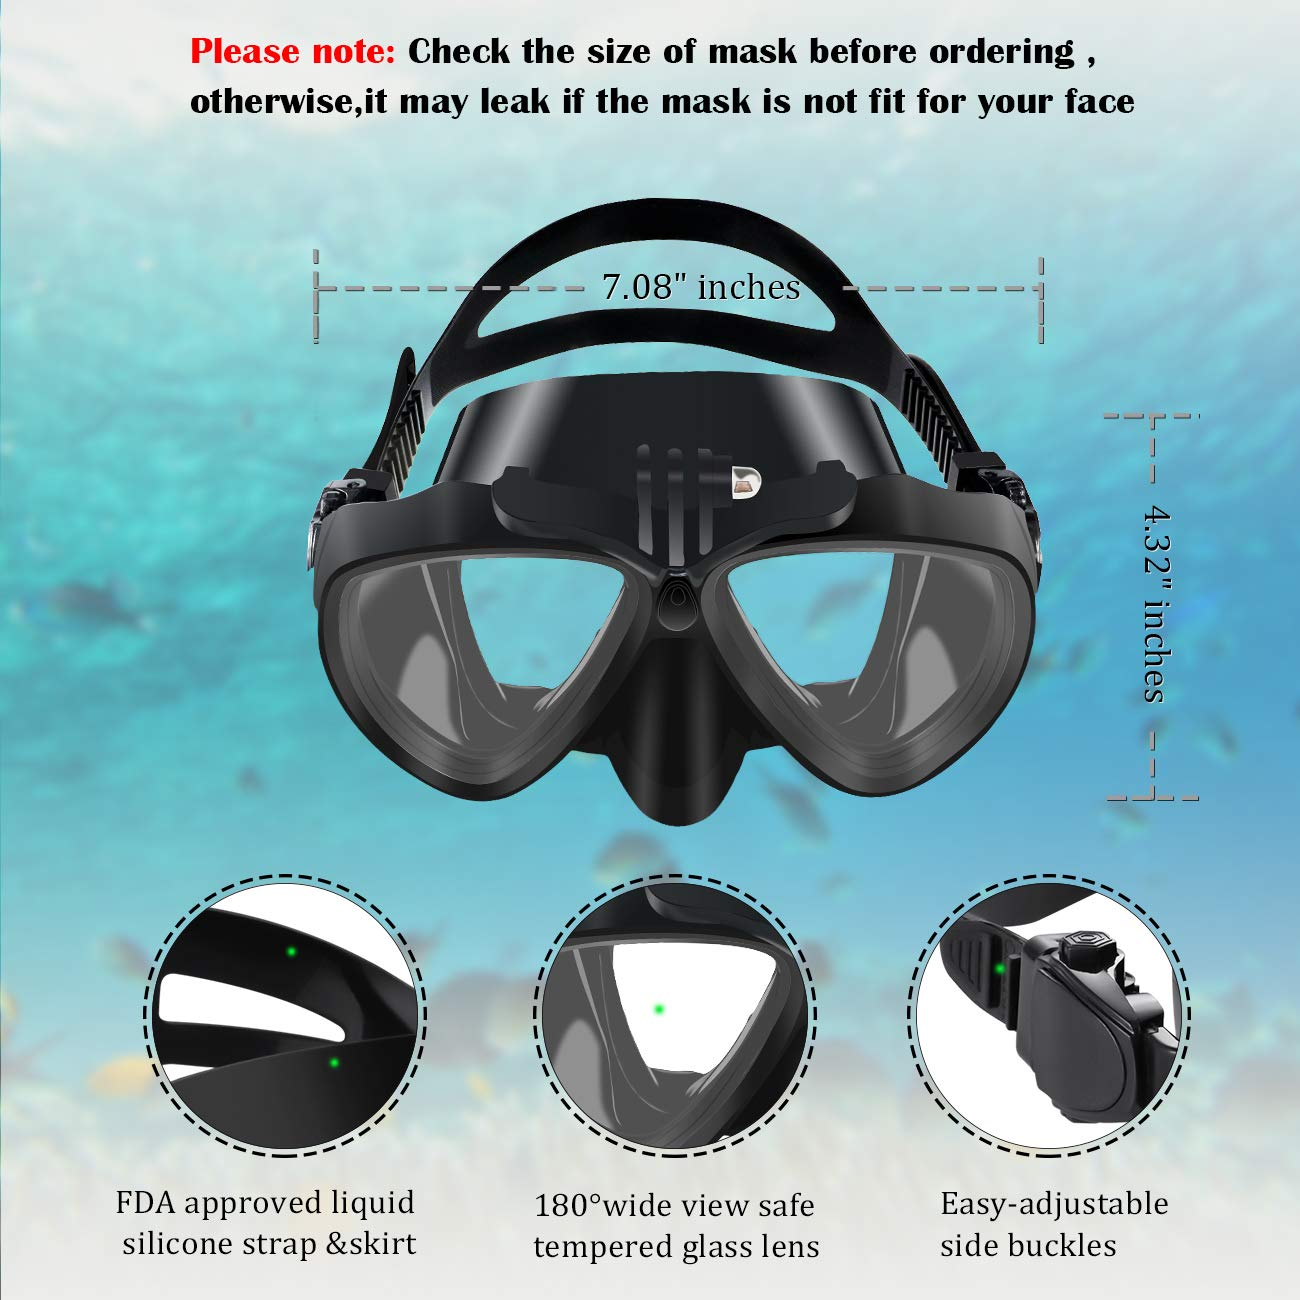 OMGear Snorkel Set Snorkeling Gear Package Diving Set Premium Silicone Dive Mask Snorkel Equipment Goggles Anti-Fog Anti-Leak Neoprene Mask Strap Scuba Diving Freediving Spearfishing Swimming